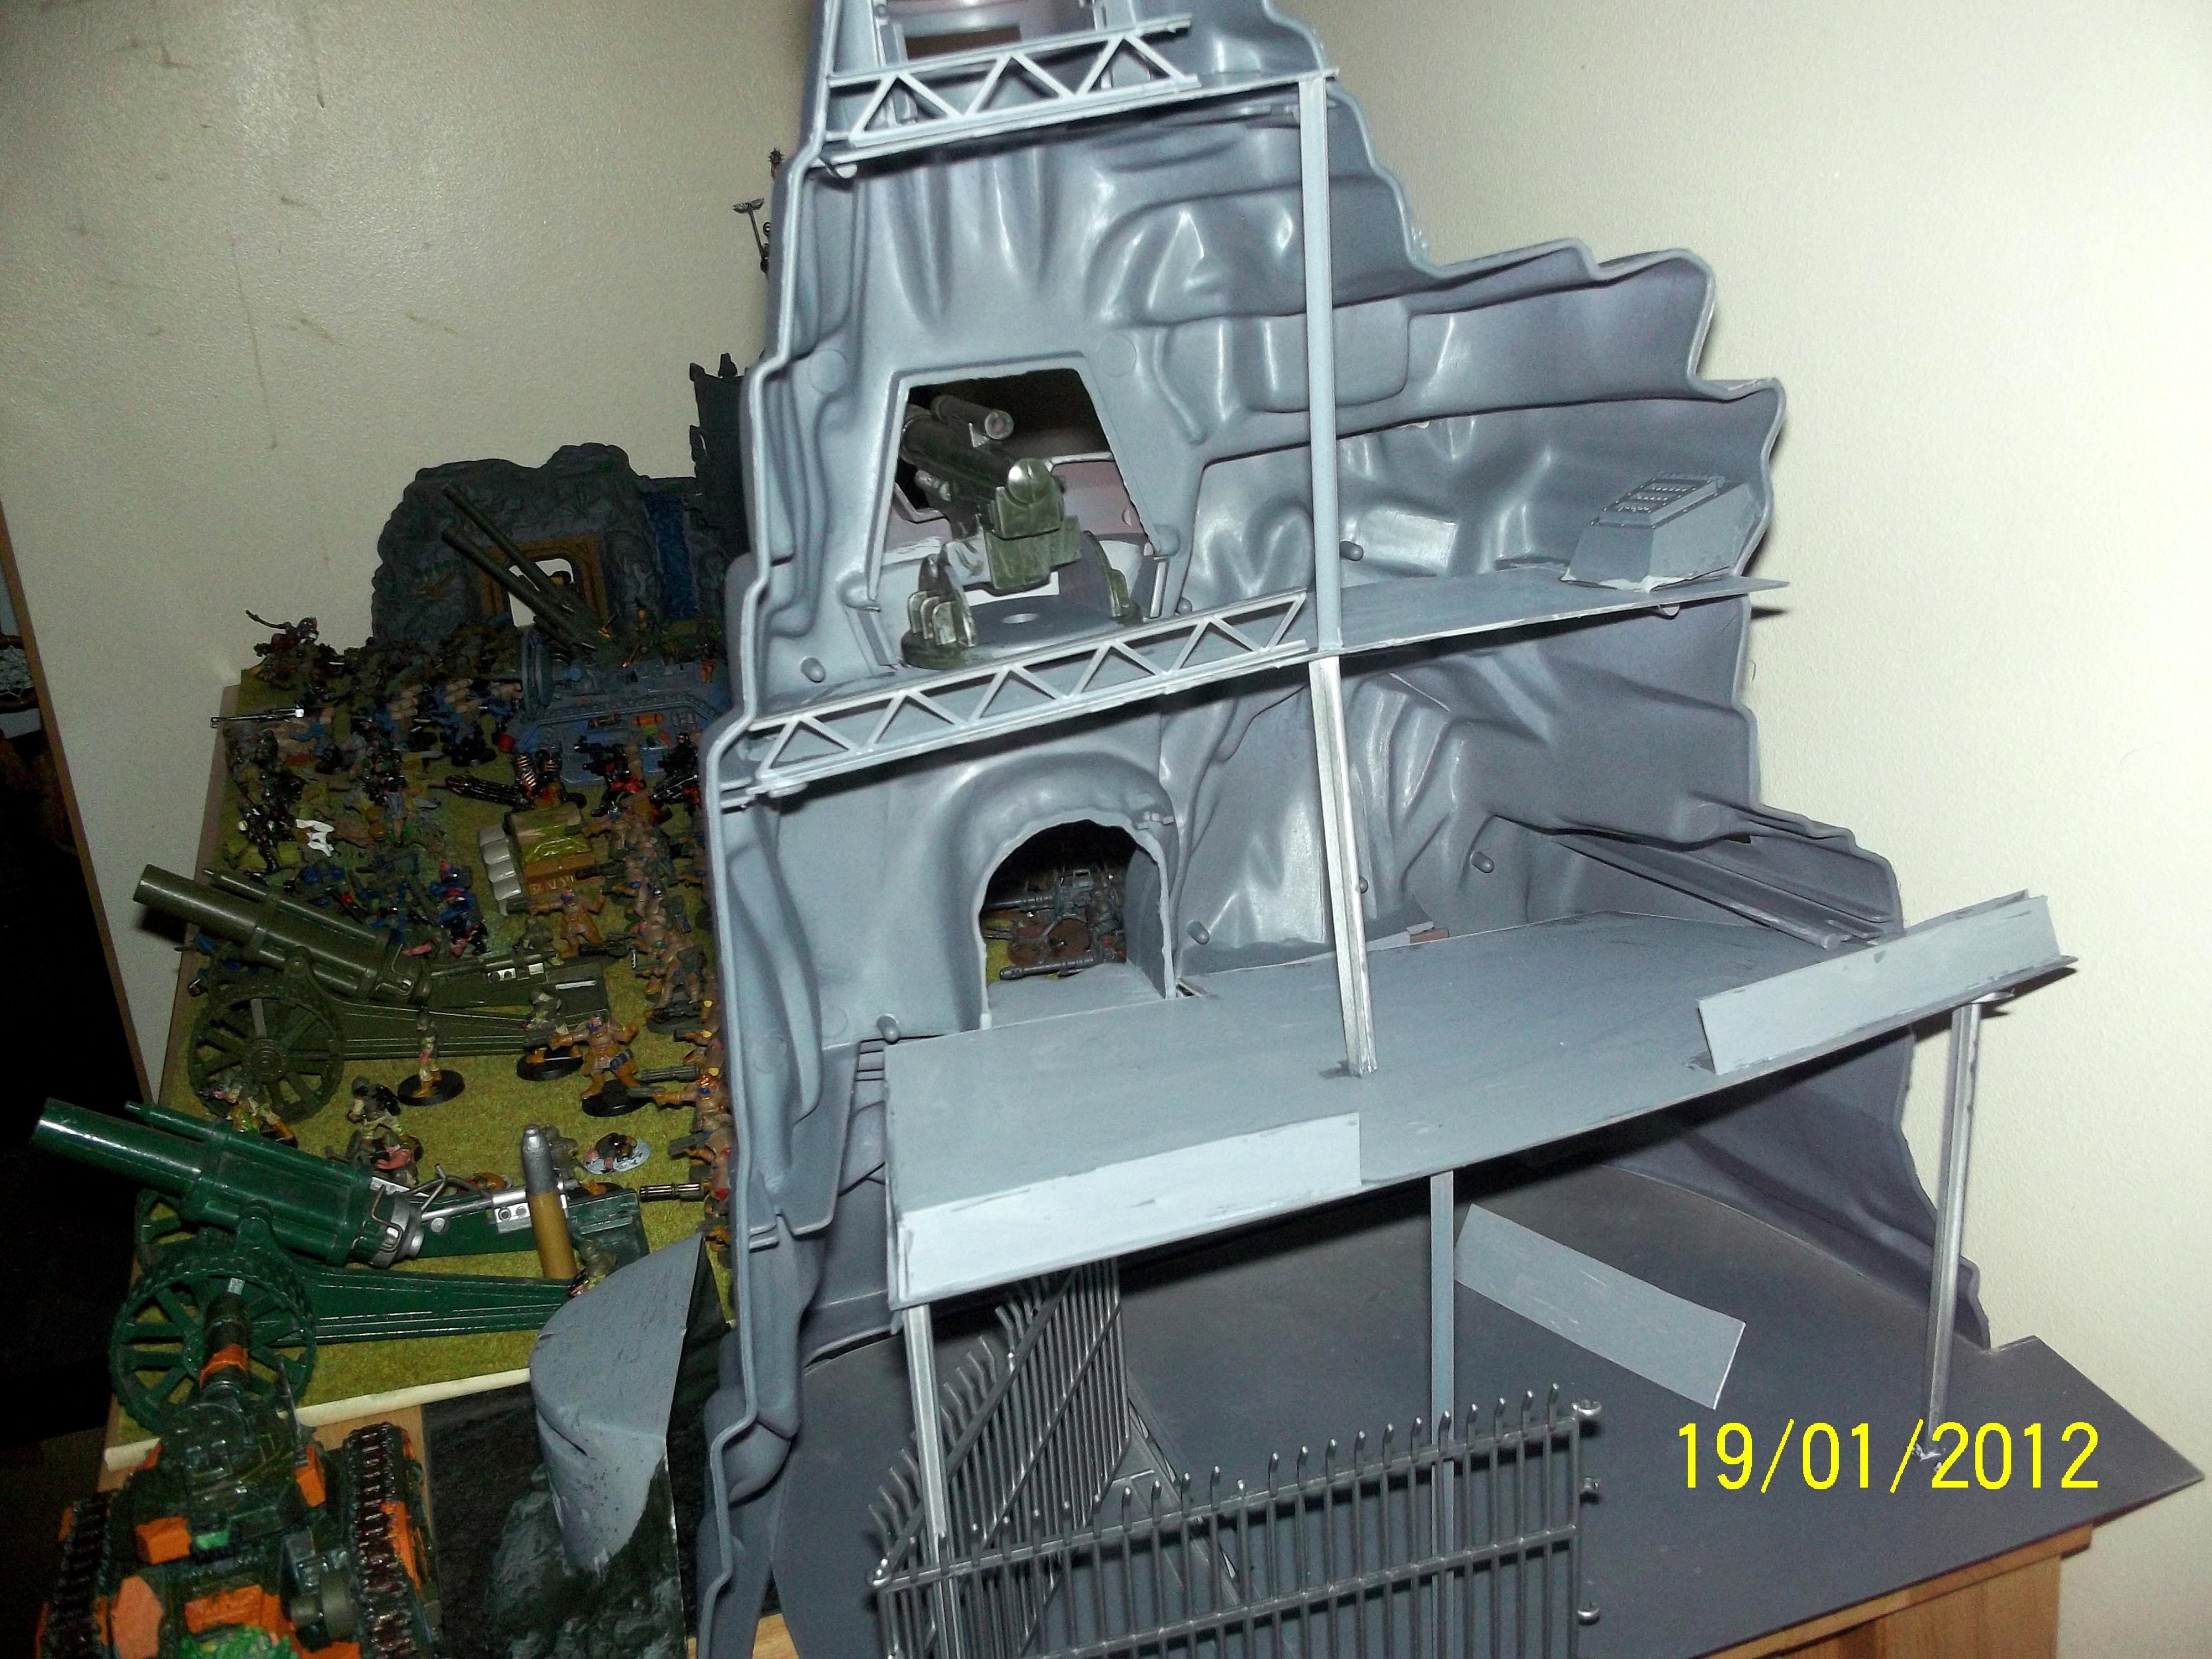 Fortress, Guns Of Navarone, Marx, Mountain, Terrain, Toy, World War 2